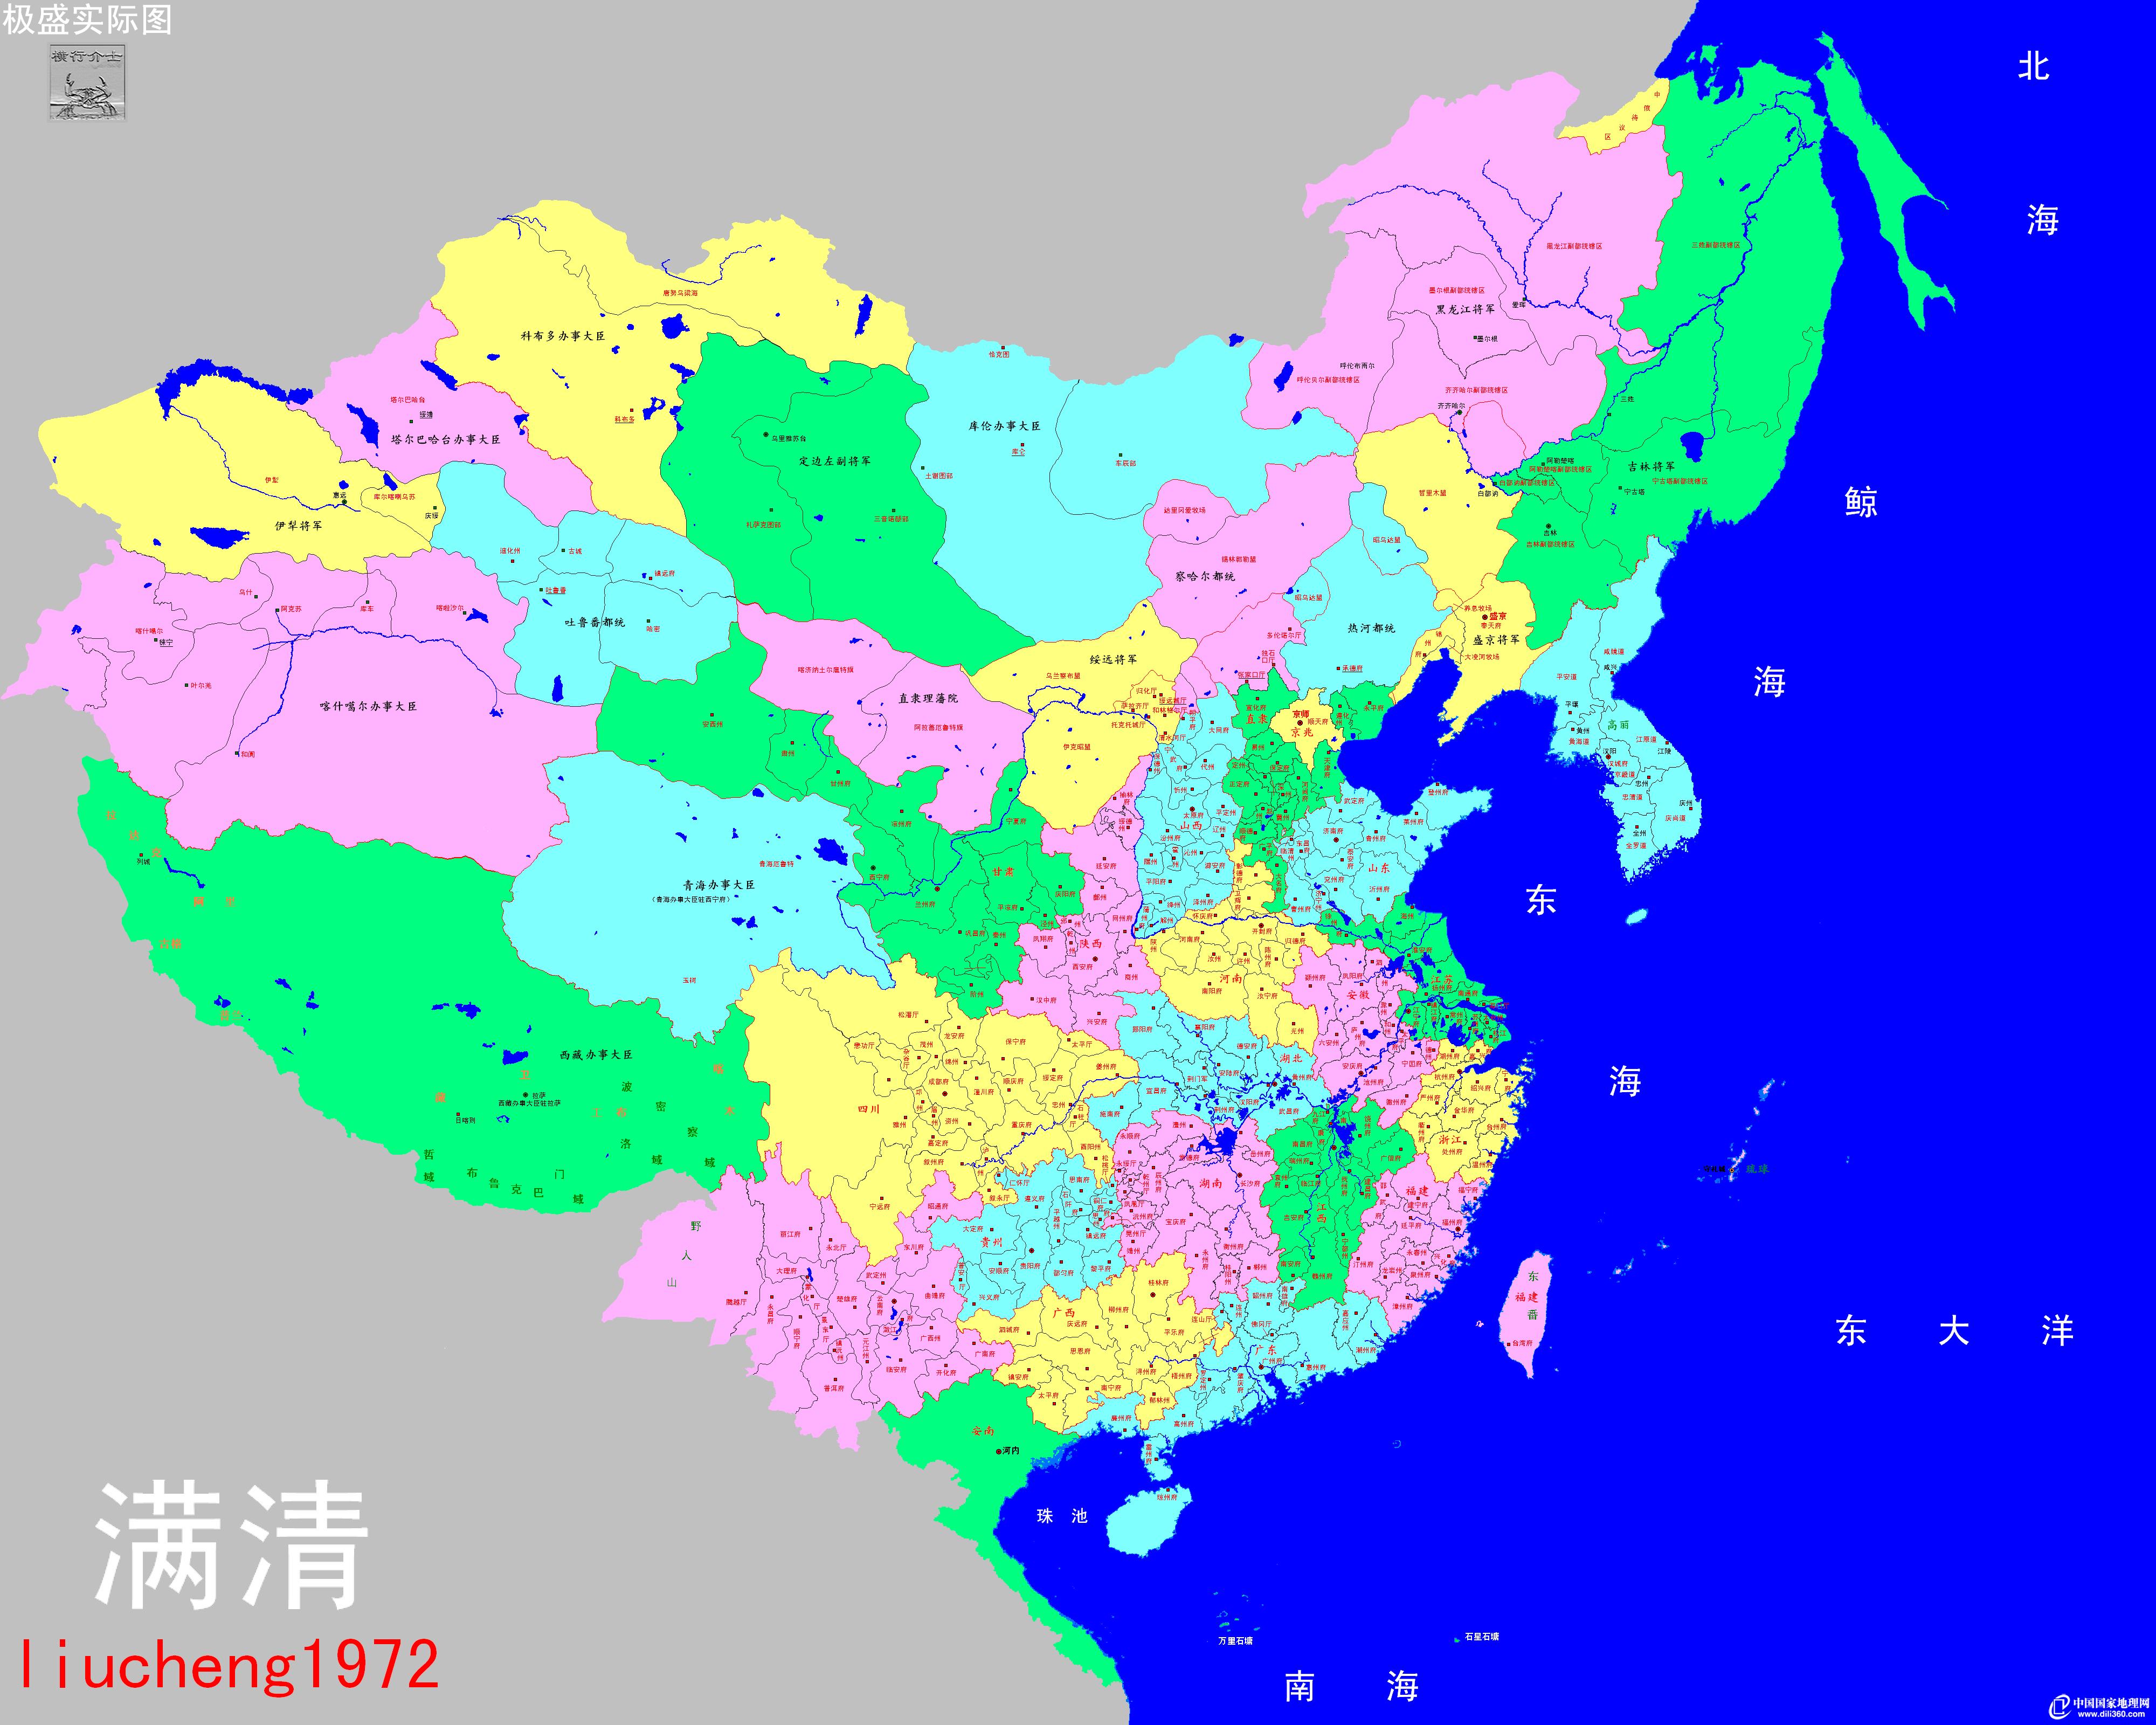 liucheng1972版中国历史地图(rev2.0)-1